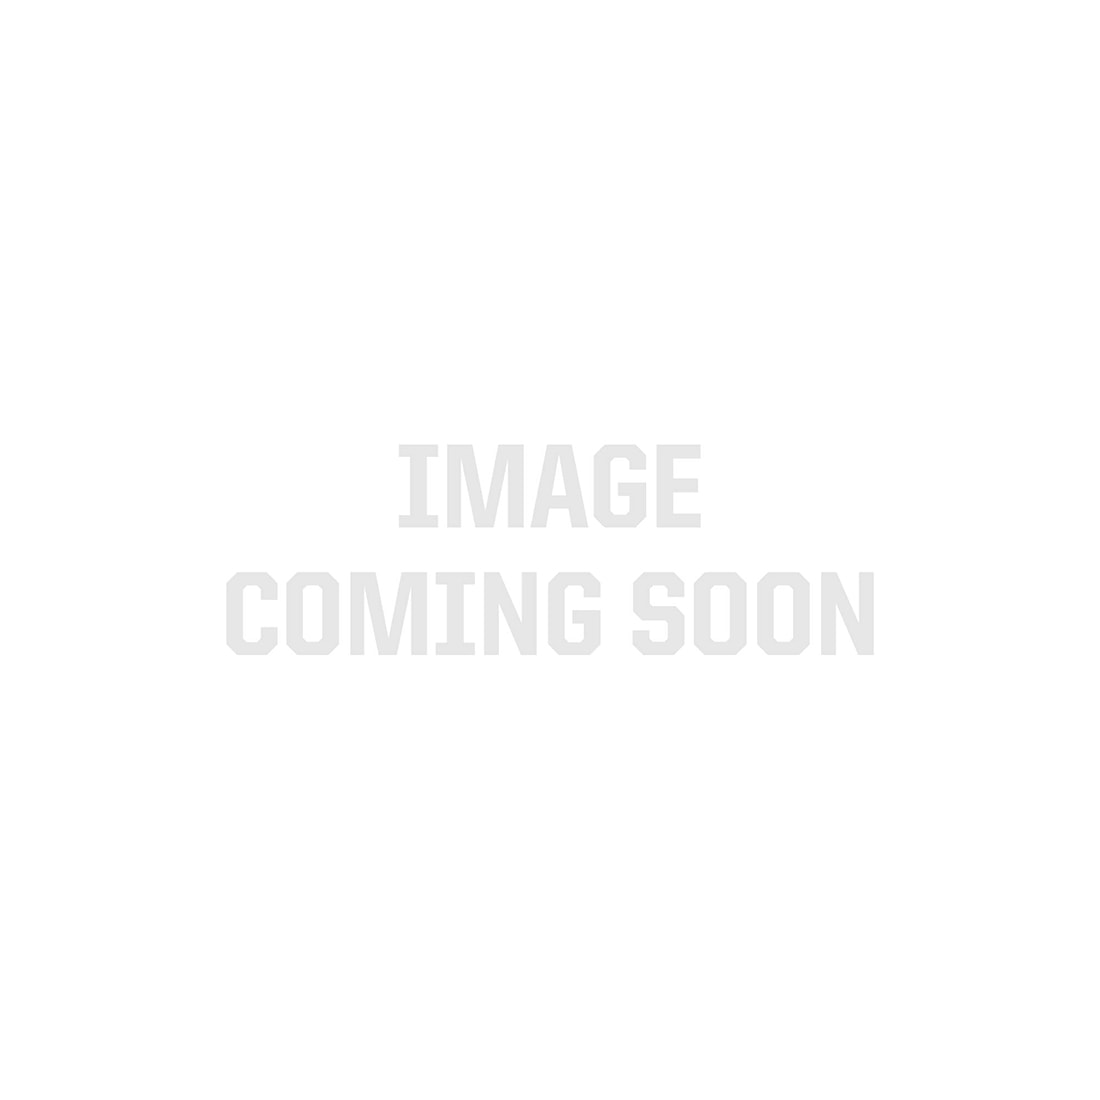 S14 Frosted Glass Dimmable LED Light Bulb, E26 (Medium) Base, 1.4 watt (Warm White)